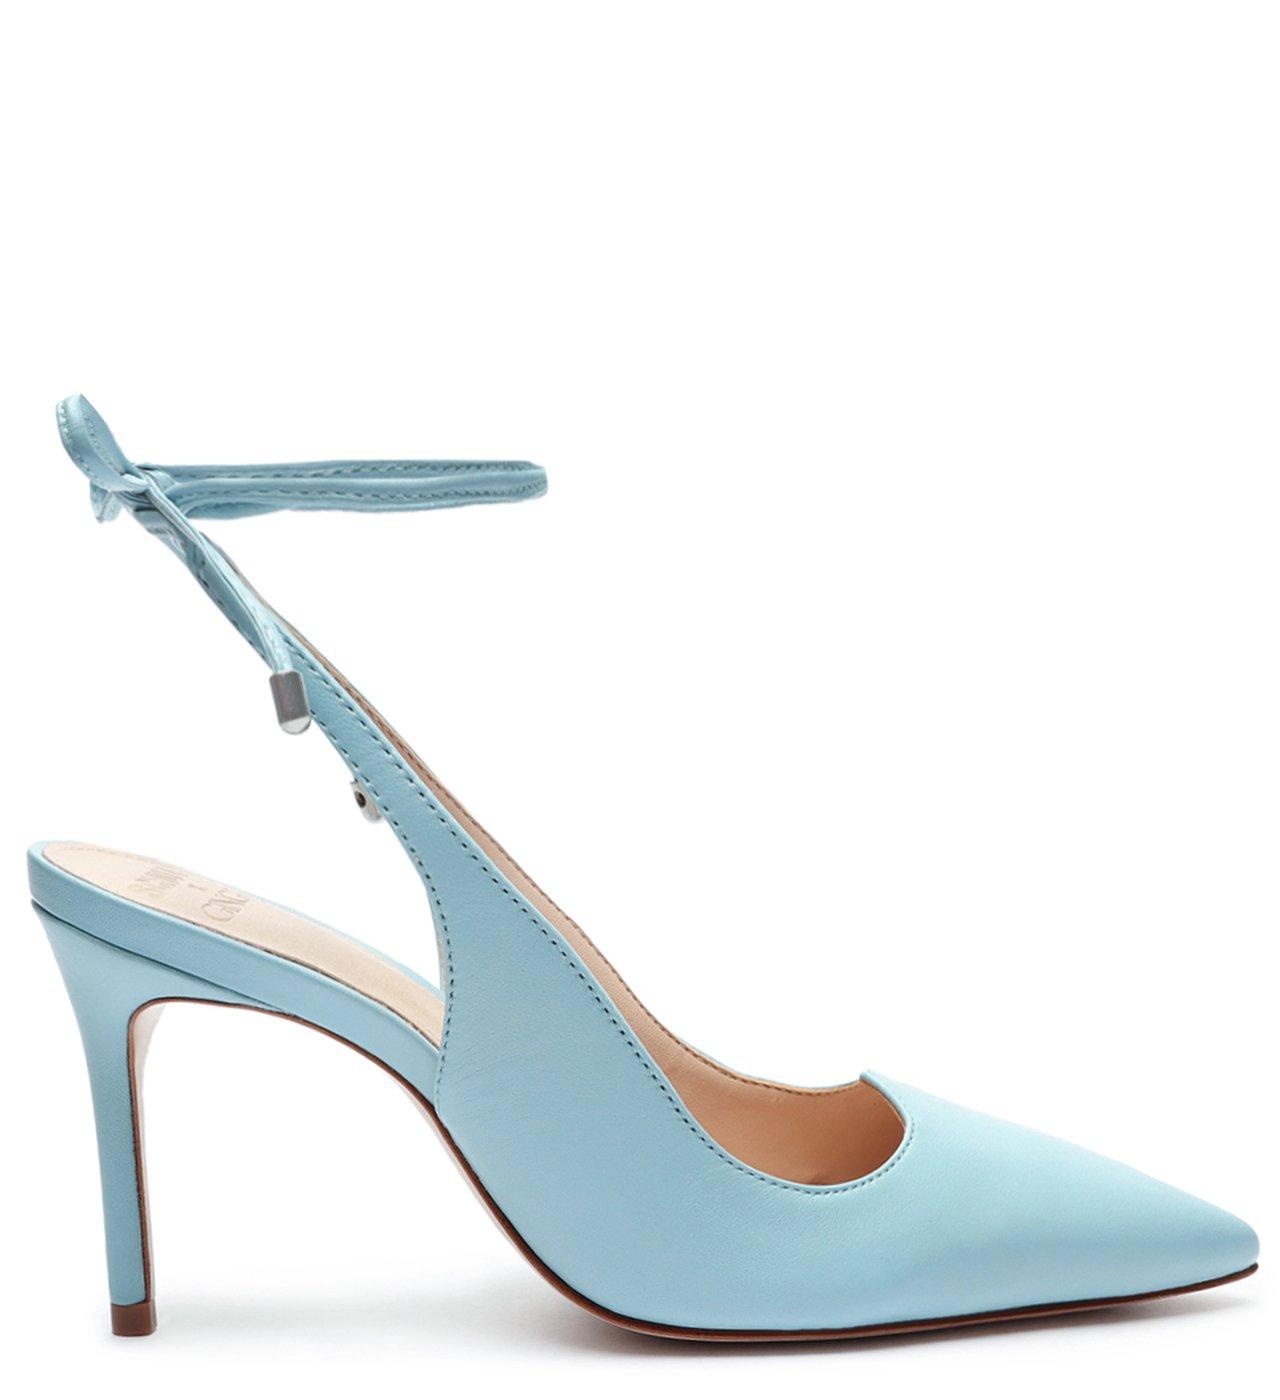 Schutz X Ginger Scarpin Lace-Up Blue | Schutz